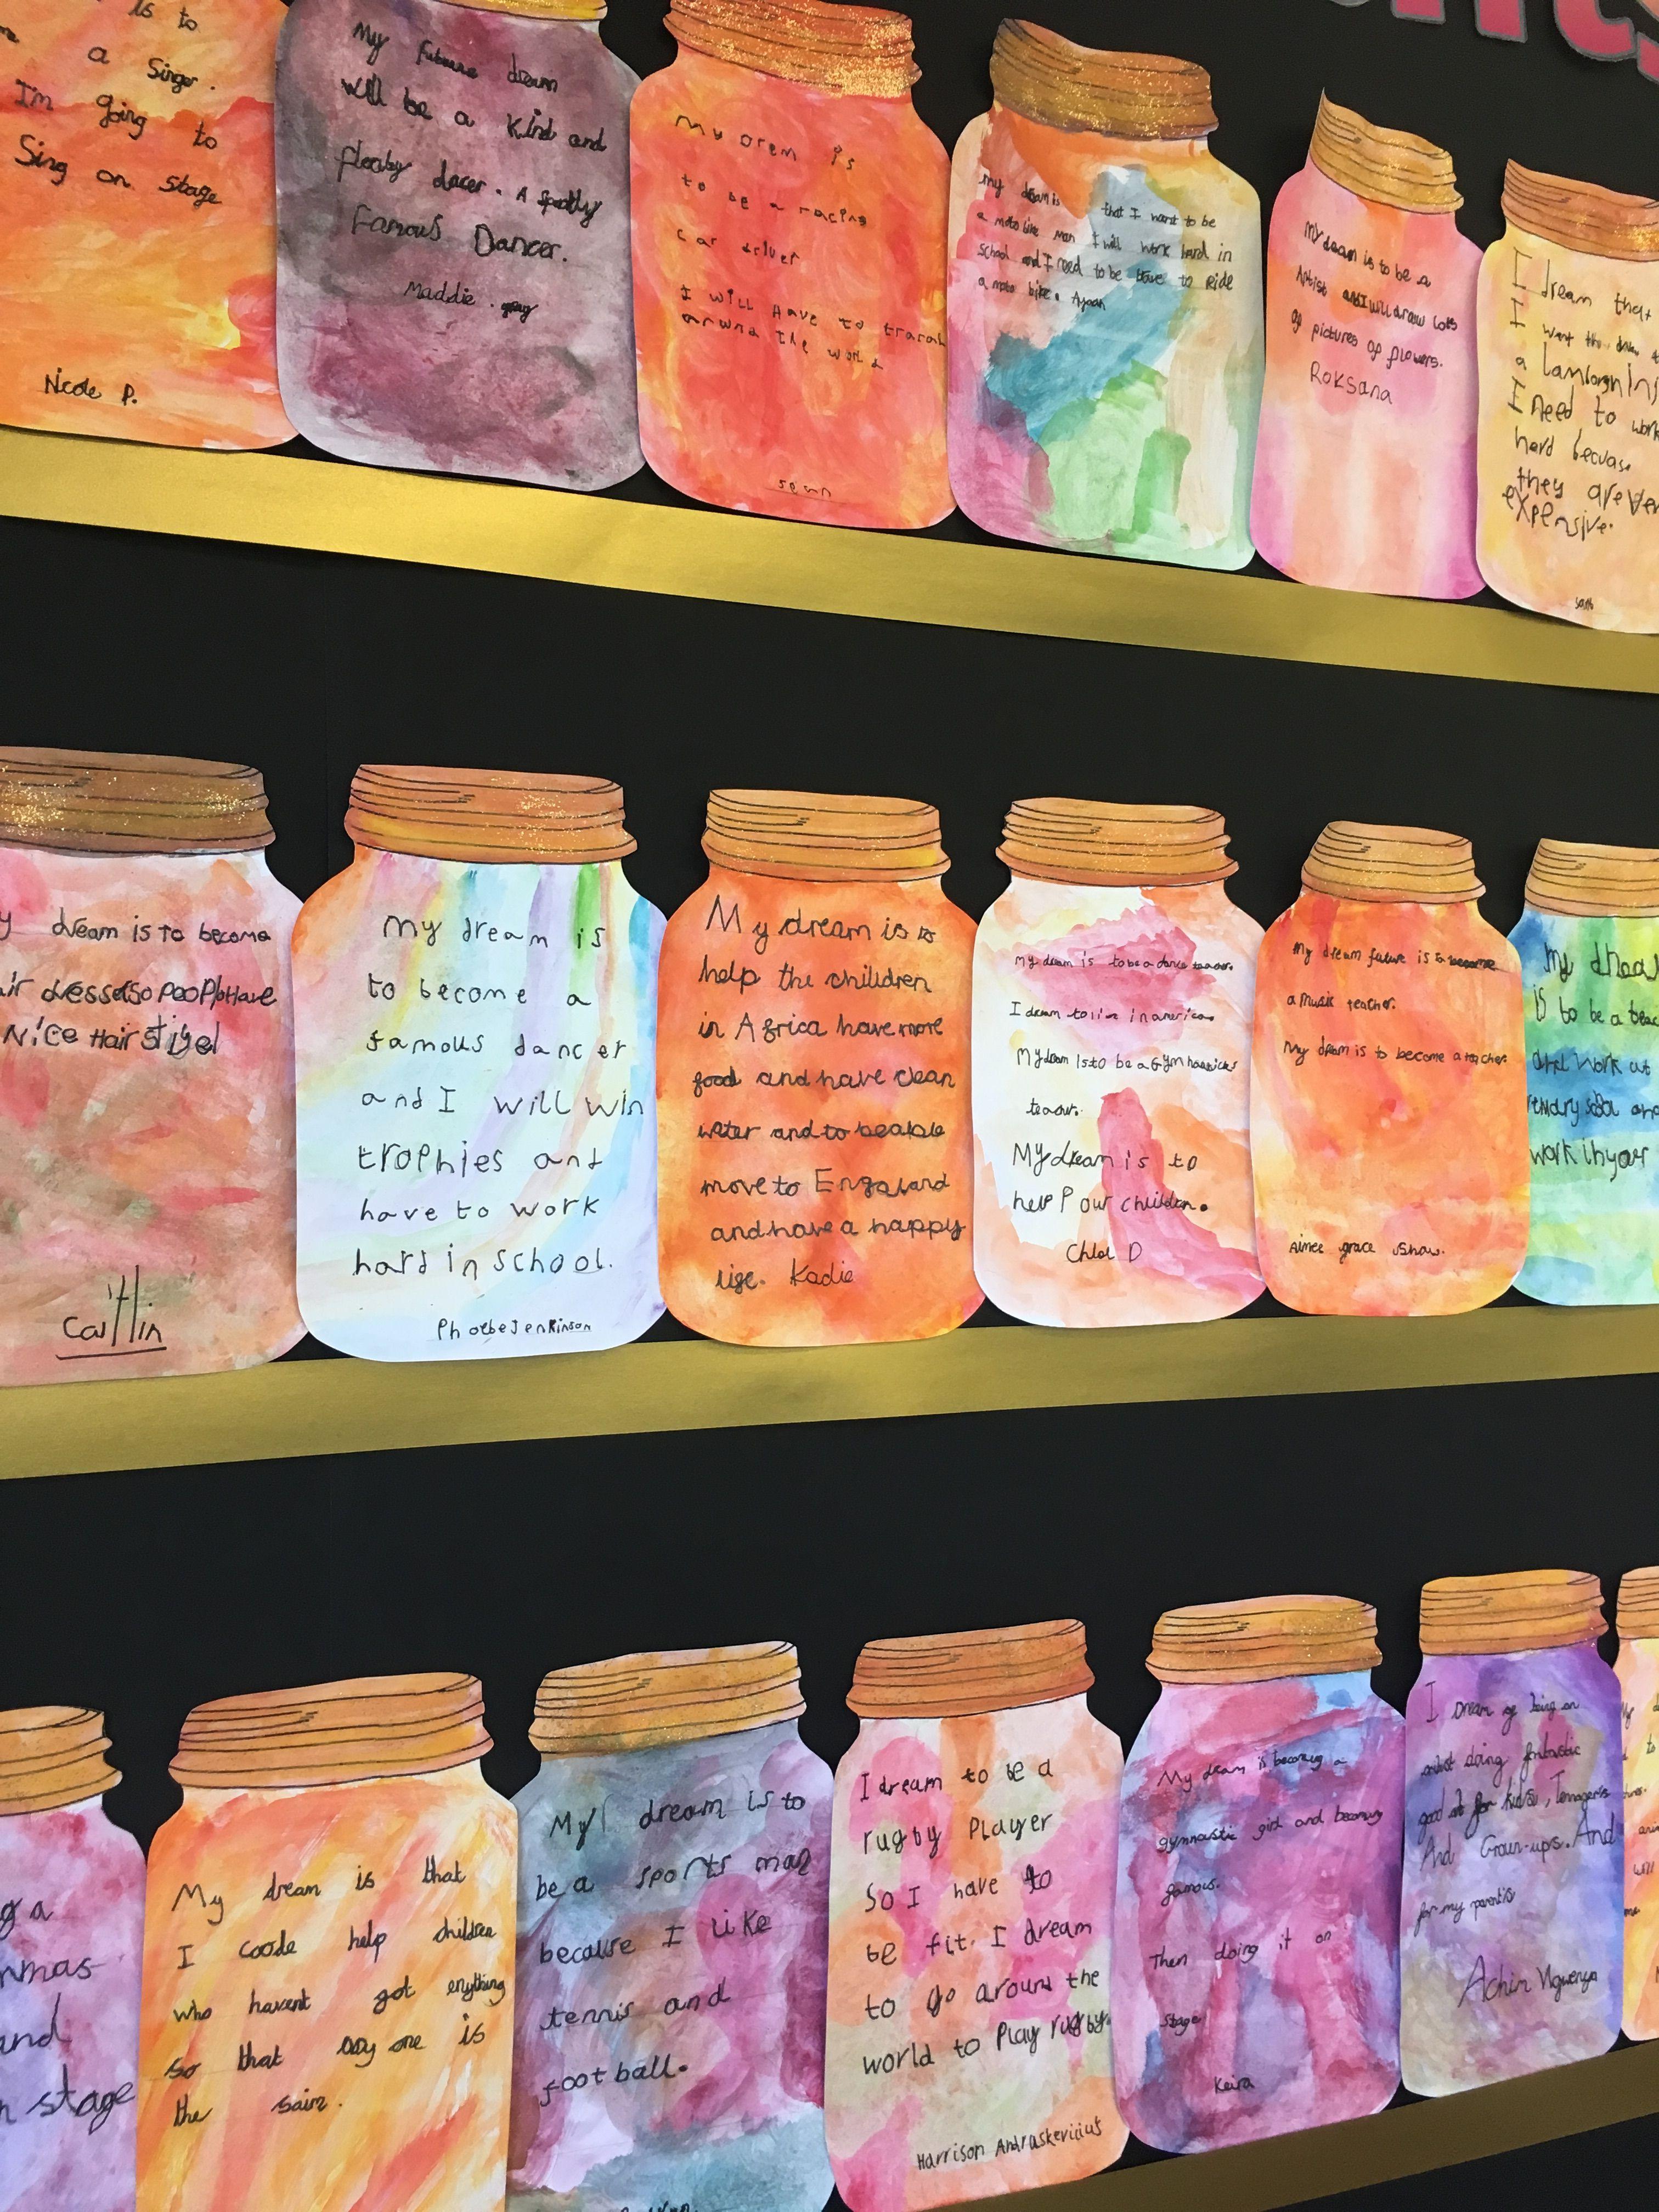 Classroom Jar Ideas : Bfg dream jar display classroom ideas pinterest